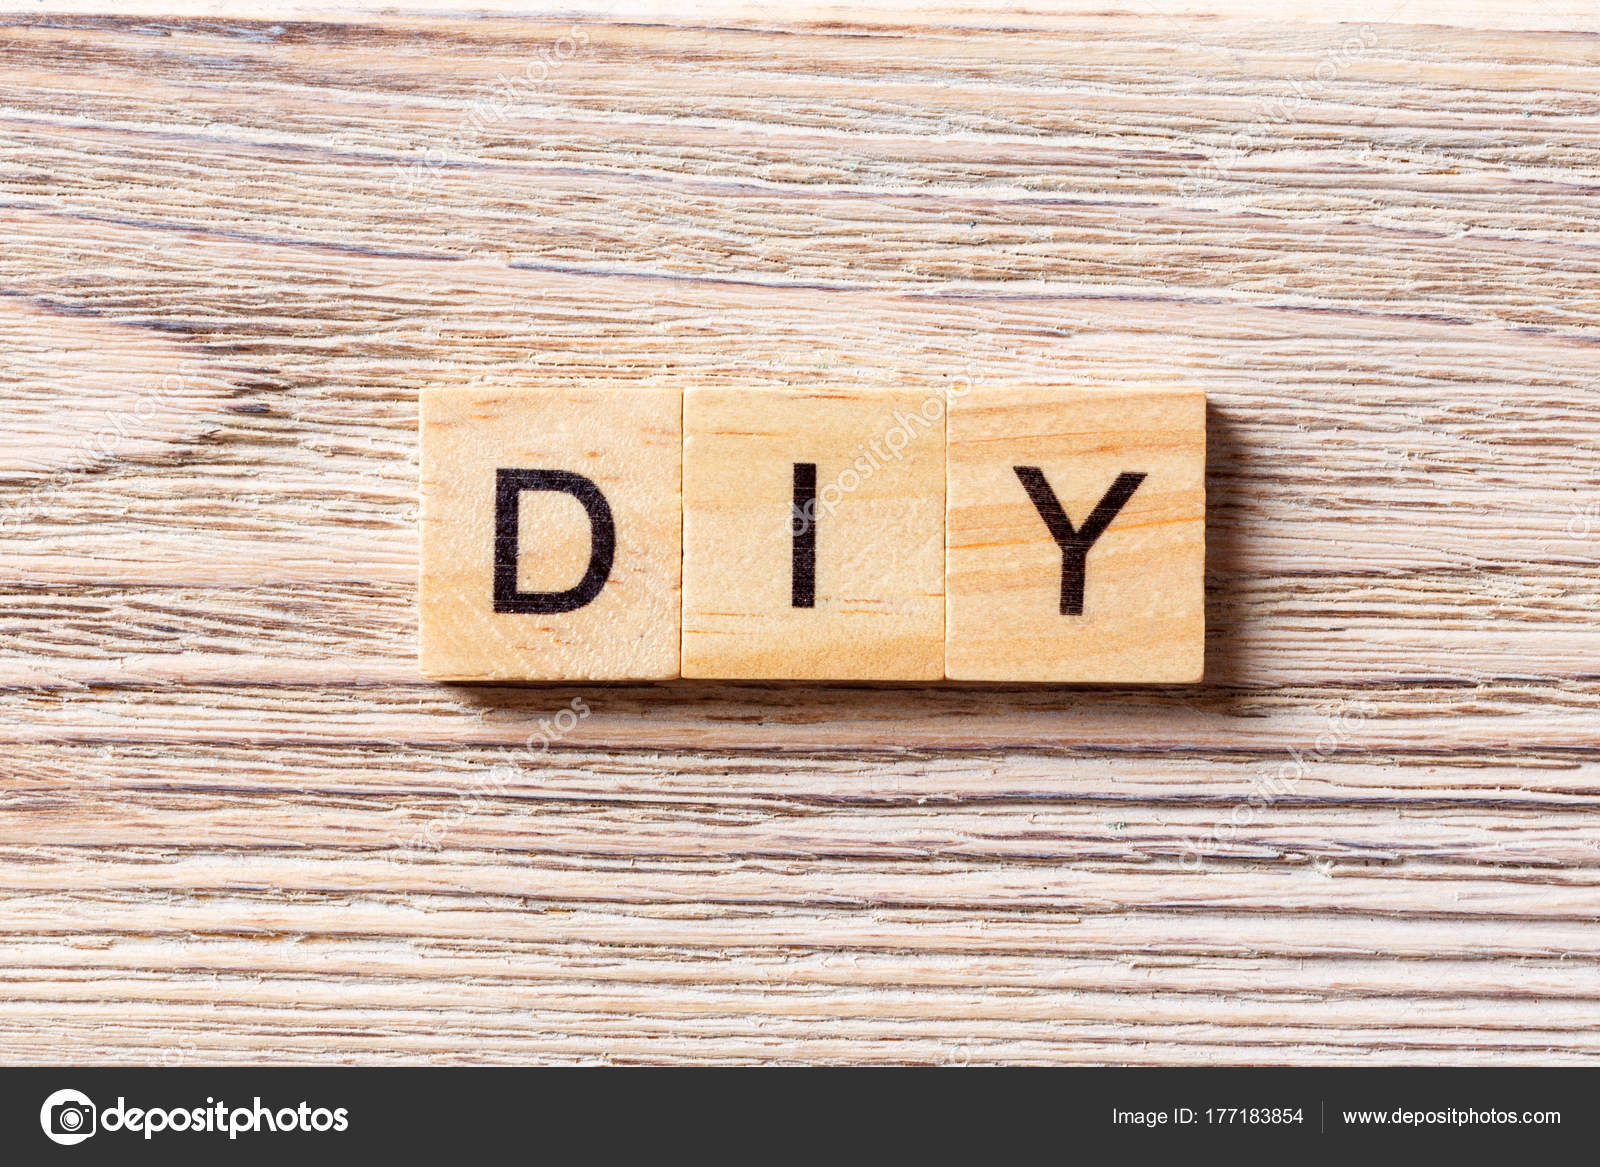 Diy word written on wood block do it yourself text on table diy word written on wood block do it yourself text on table concept solutioingenieria Gallery